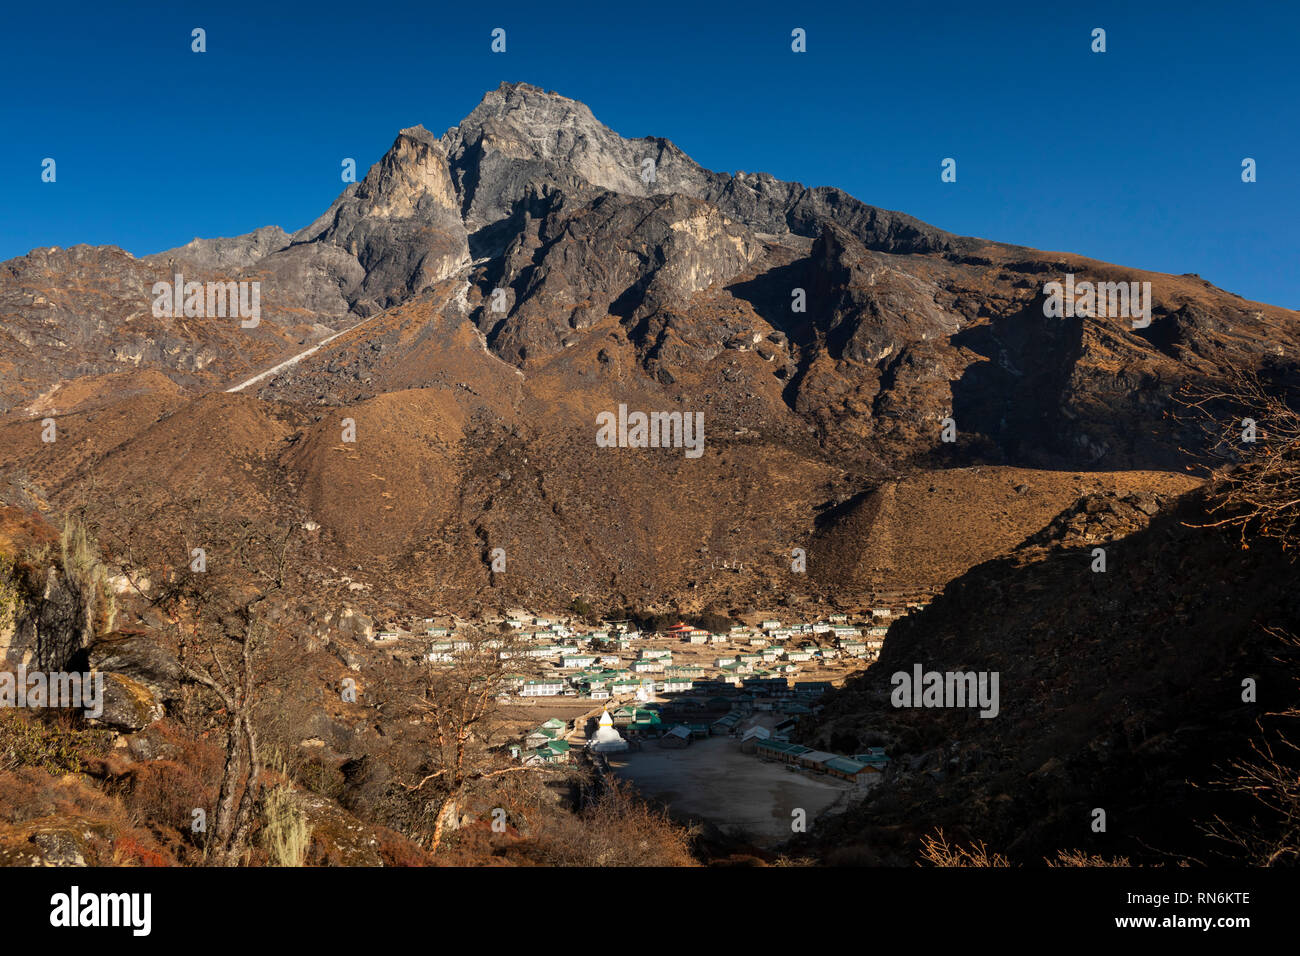 Nepal, Everest Base Camp Trek, Khumjung, elevated view of village below Mount Thame - Stock Image